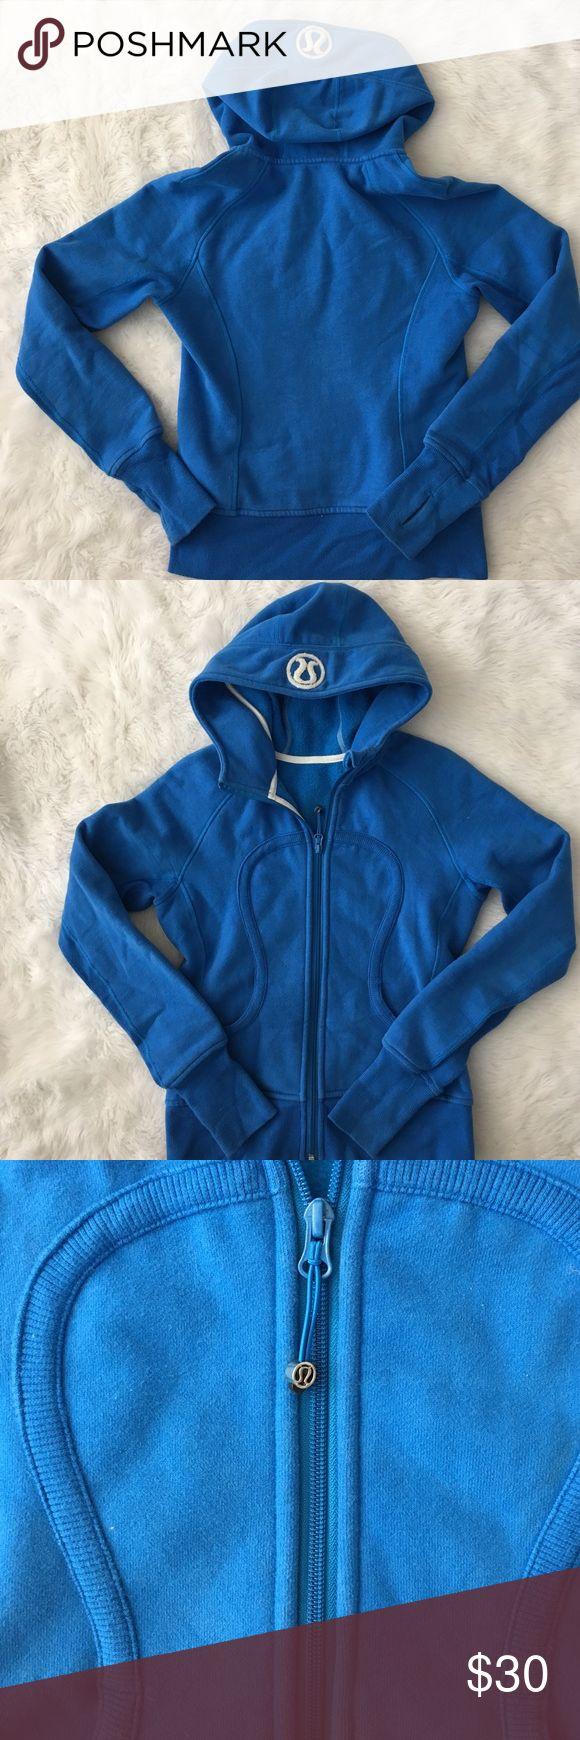 Lululemon scuba hoodie Lululemon scuba hoodie. Size 6. Colbalt blue. lululemon athletica Jackets & Coats